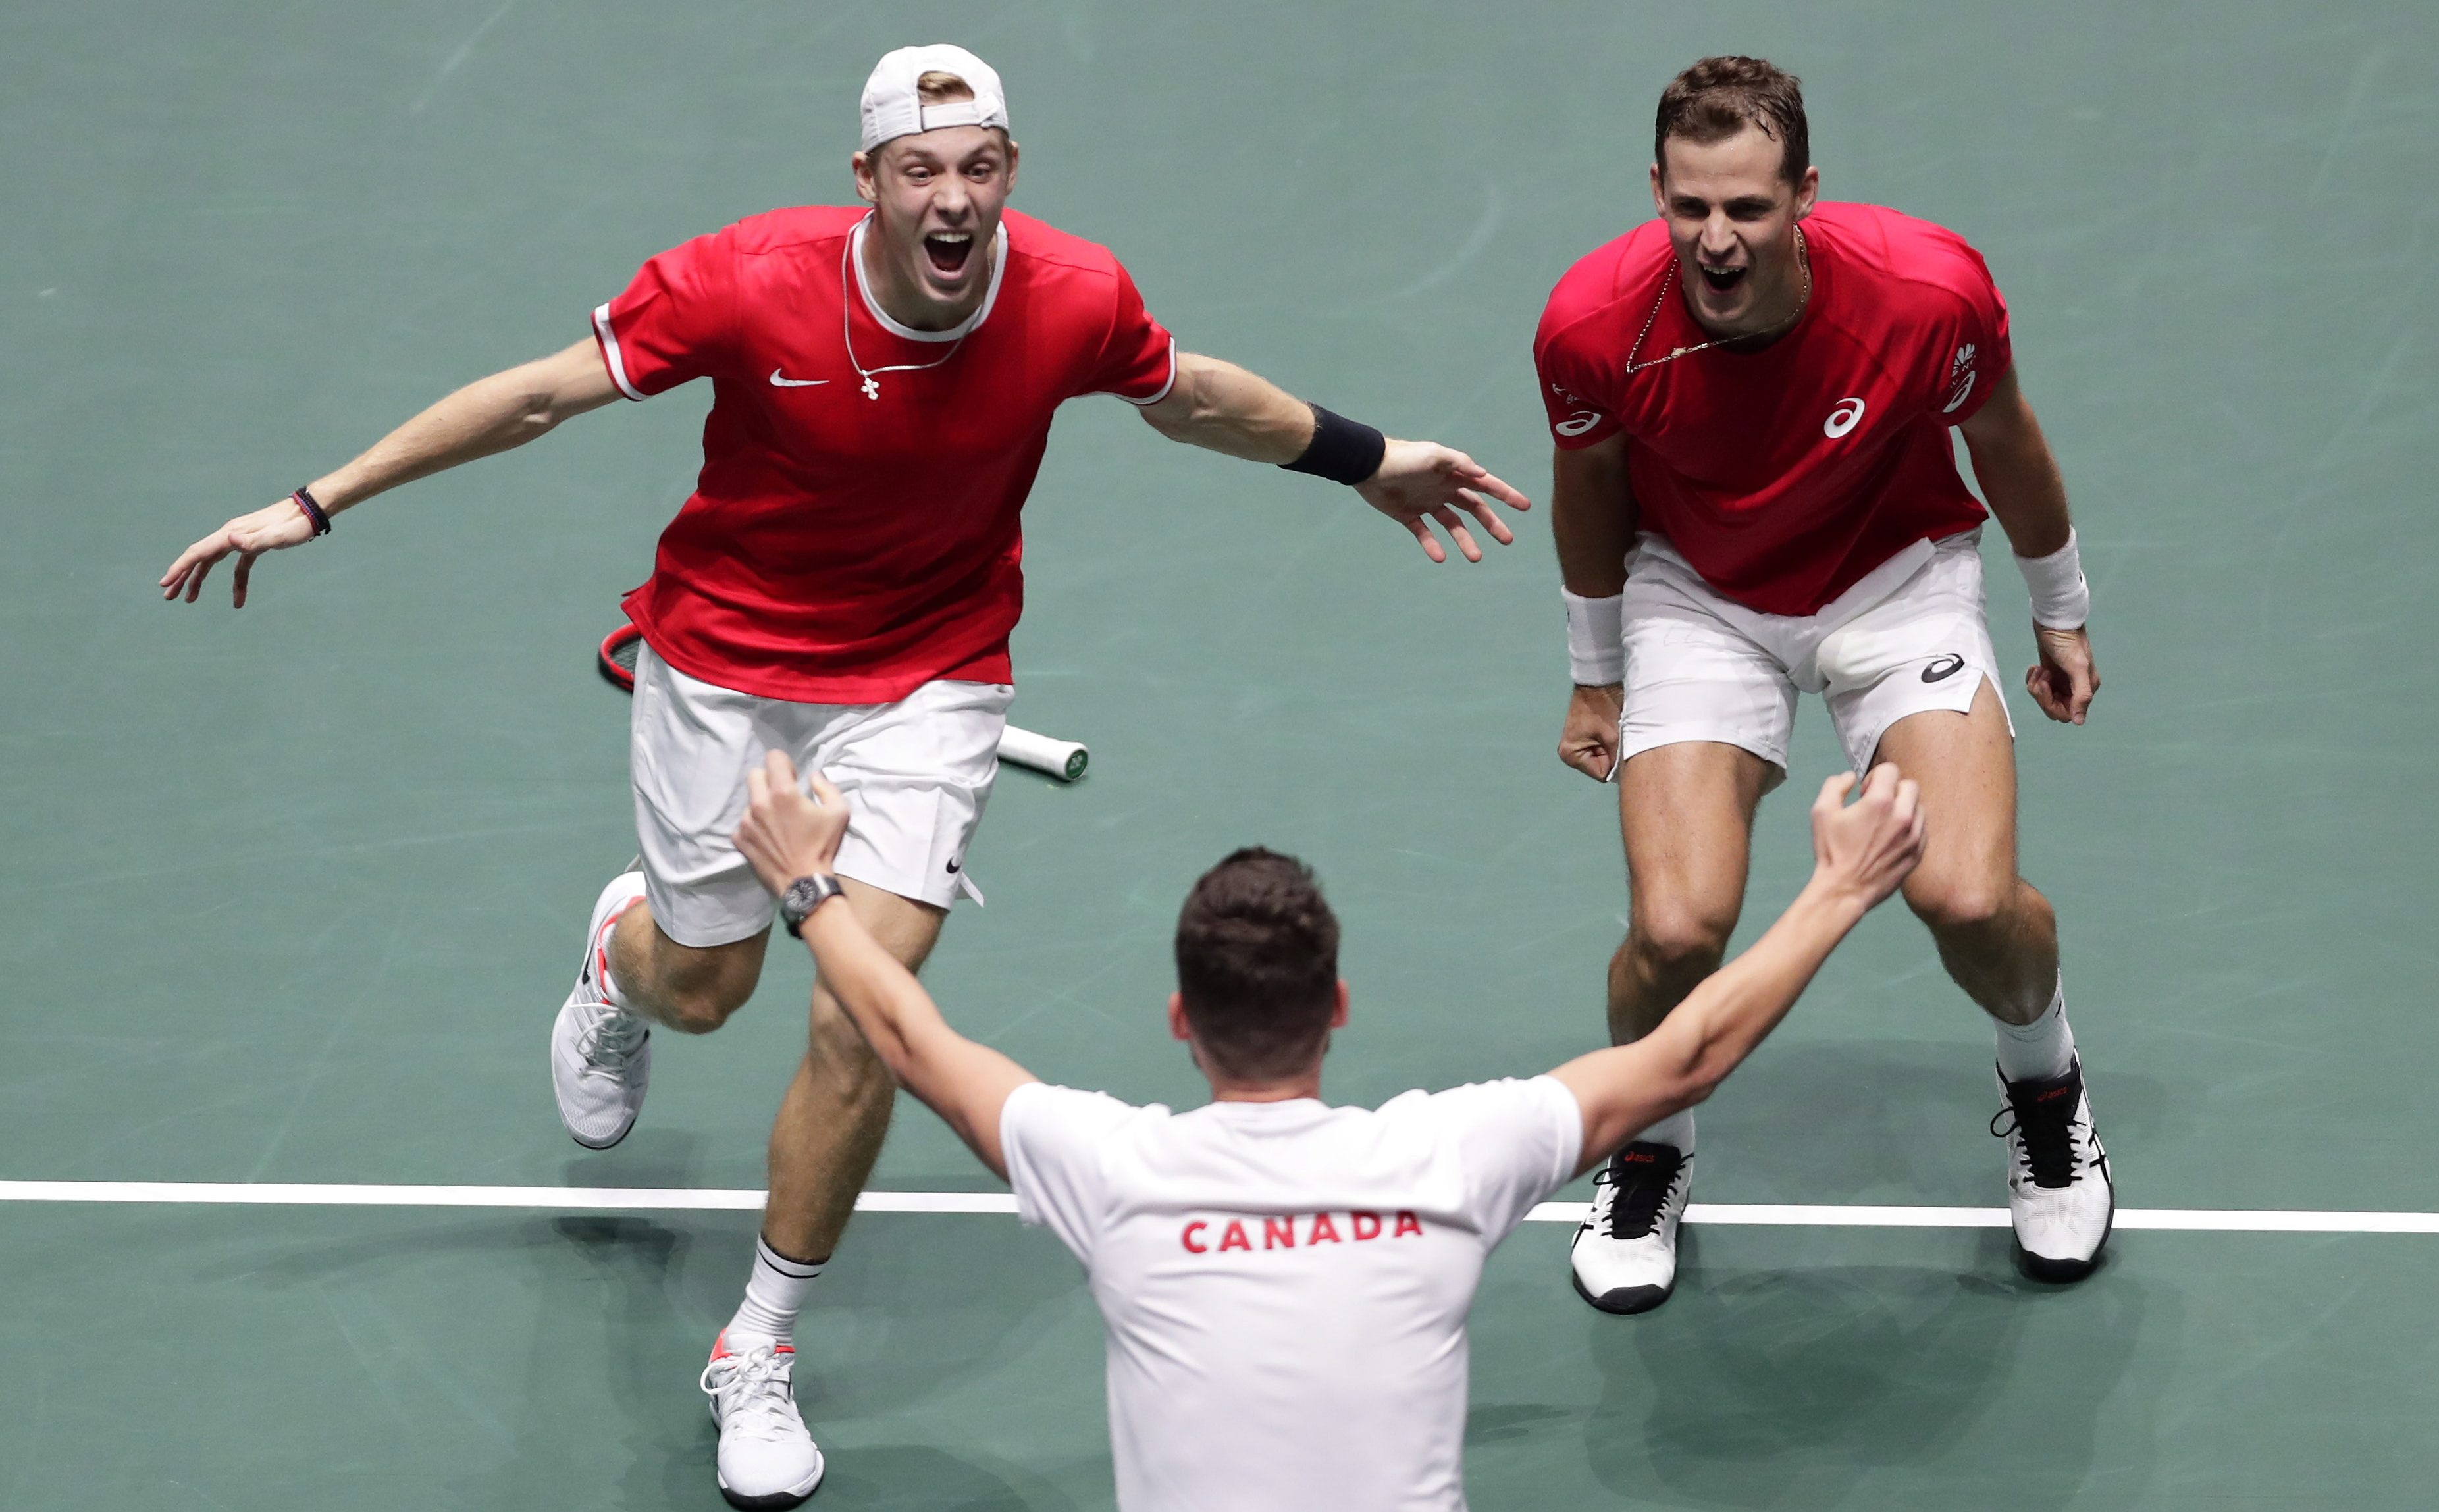 Denis (left) and Vasek run towards Frank (centre) after winning their semis match.